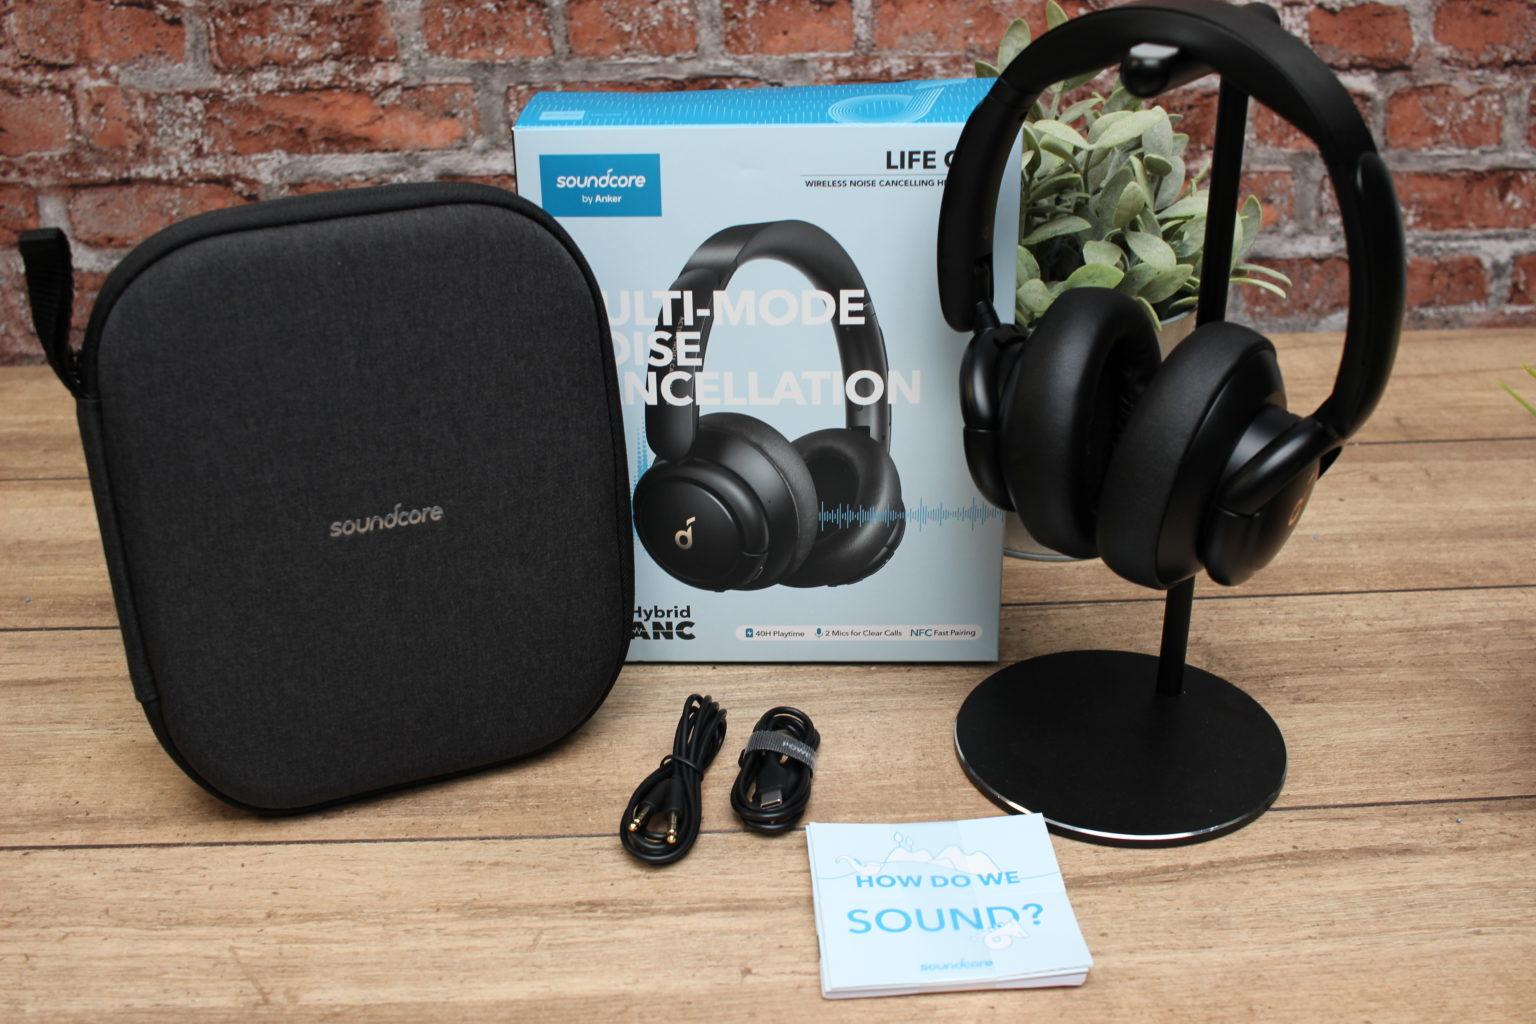 Accesorios de los auriculares bluetooth over-ear Soundcore Life Q30